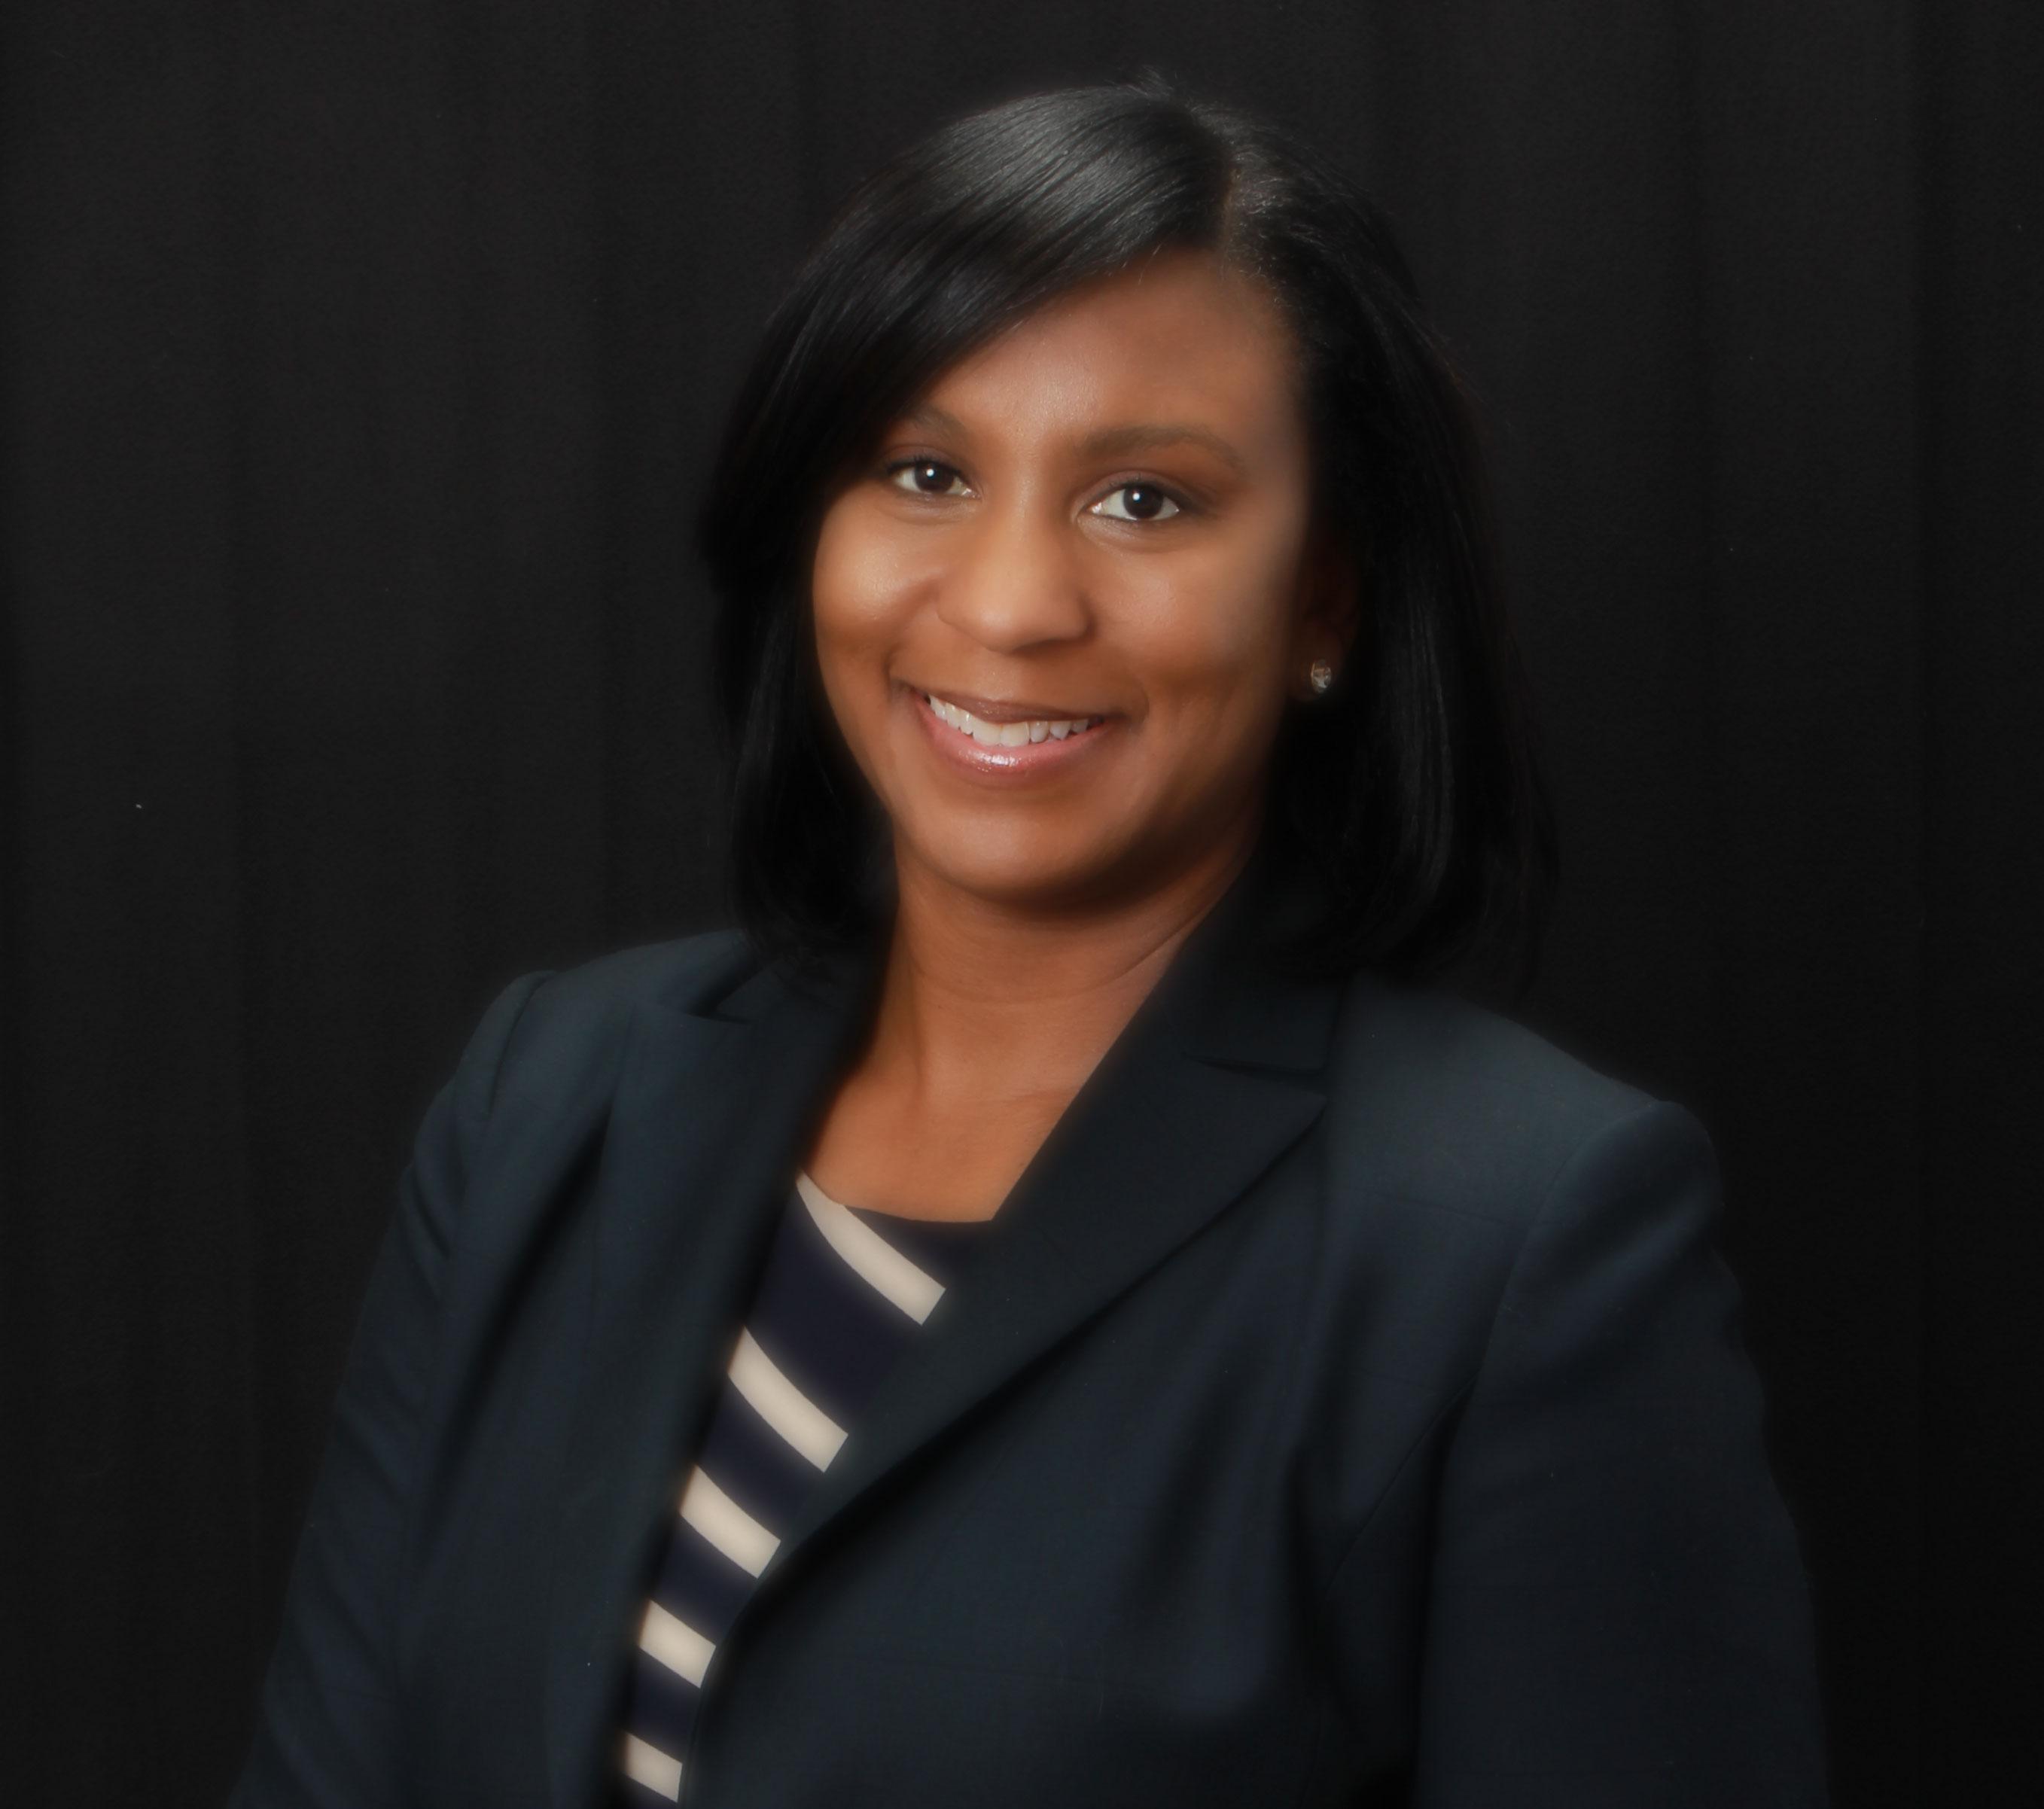 Linda Haugan Announces Oct. 15 Retirement; CaSonya Thomas Appointed as Successor